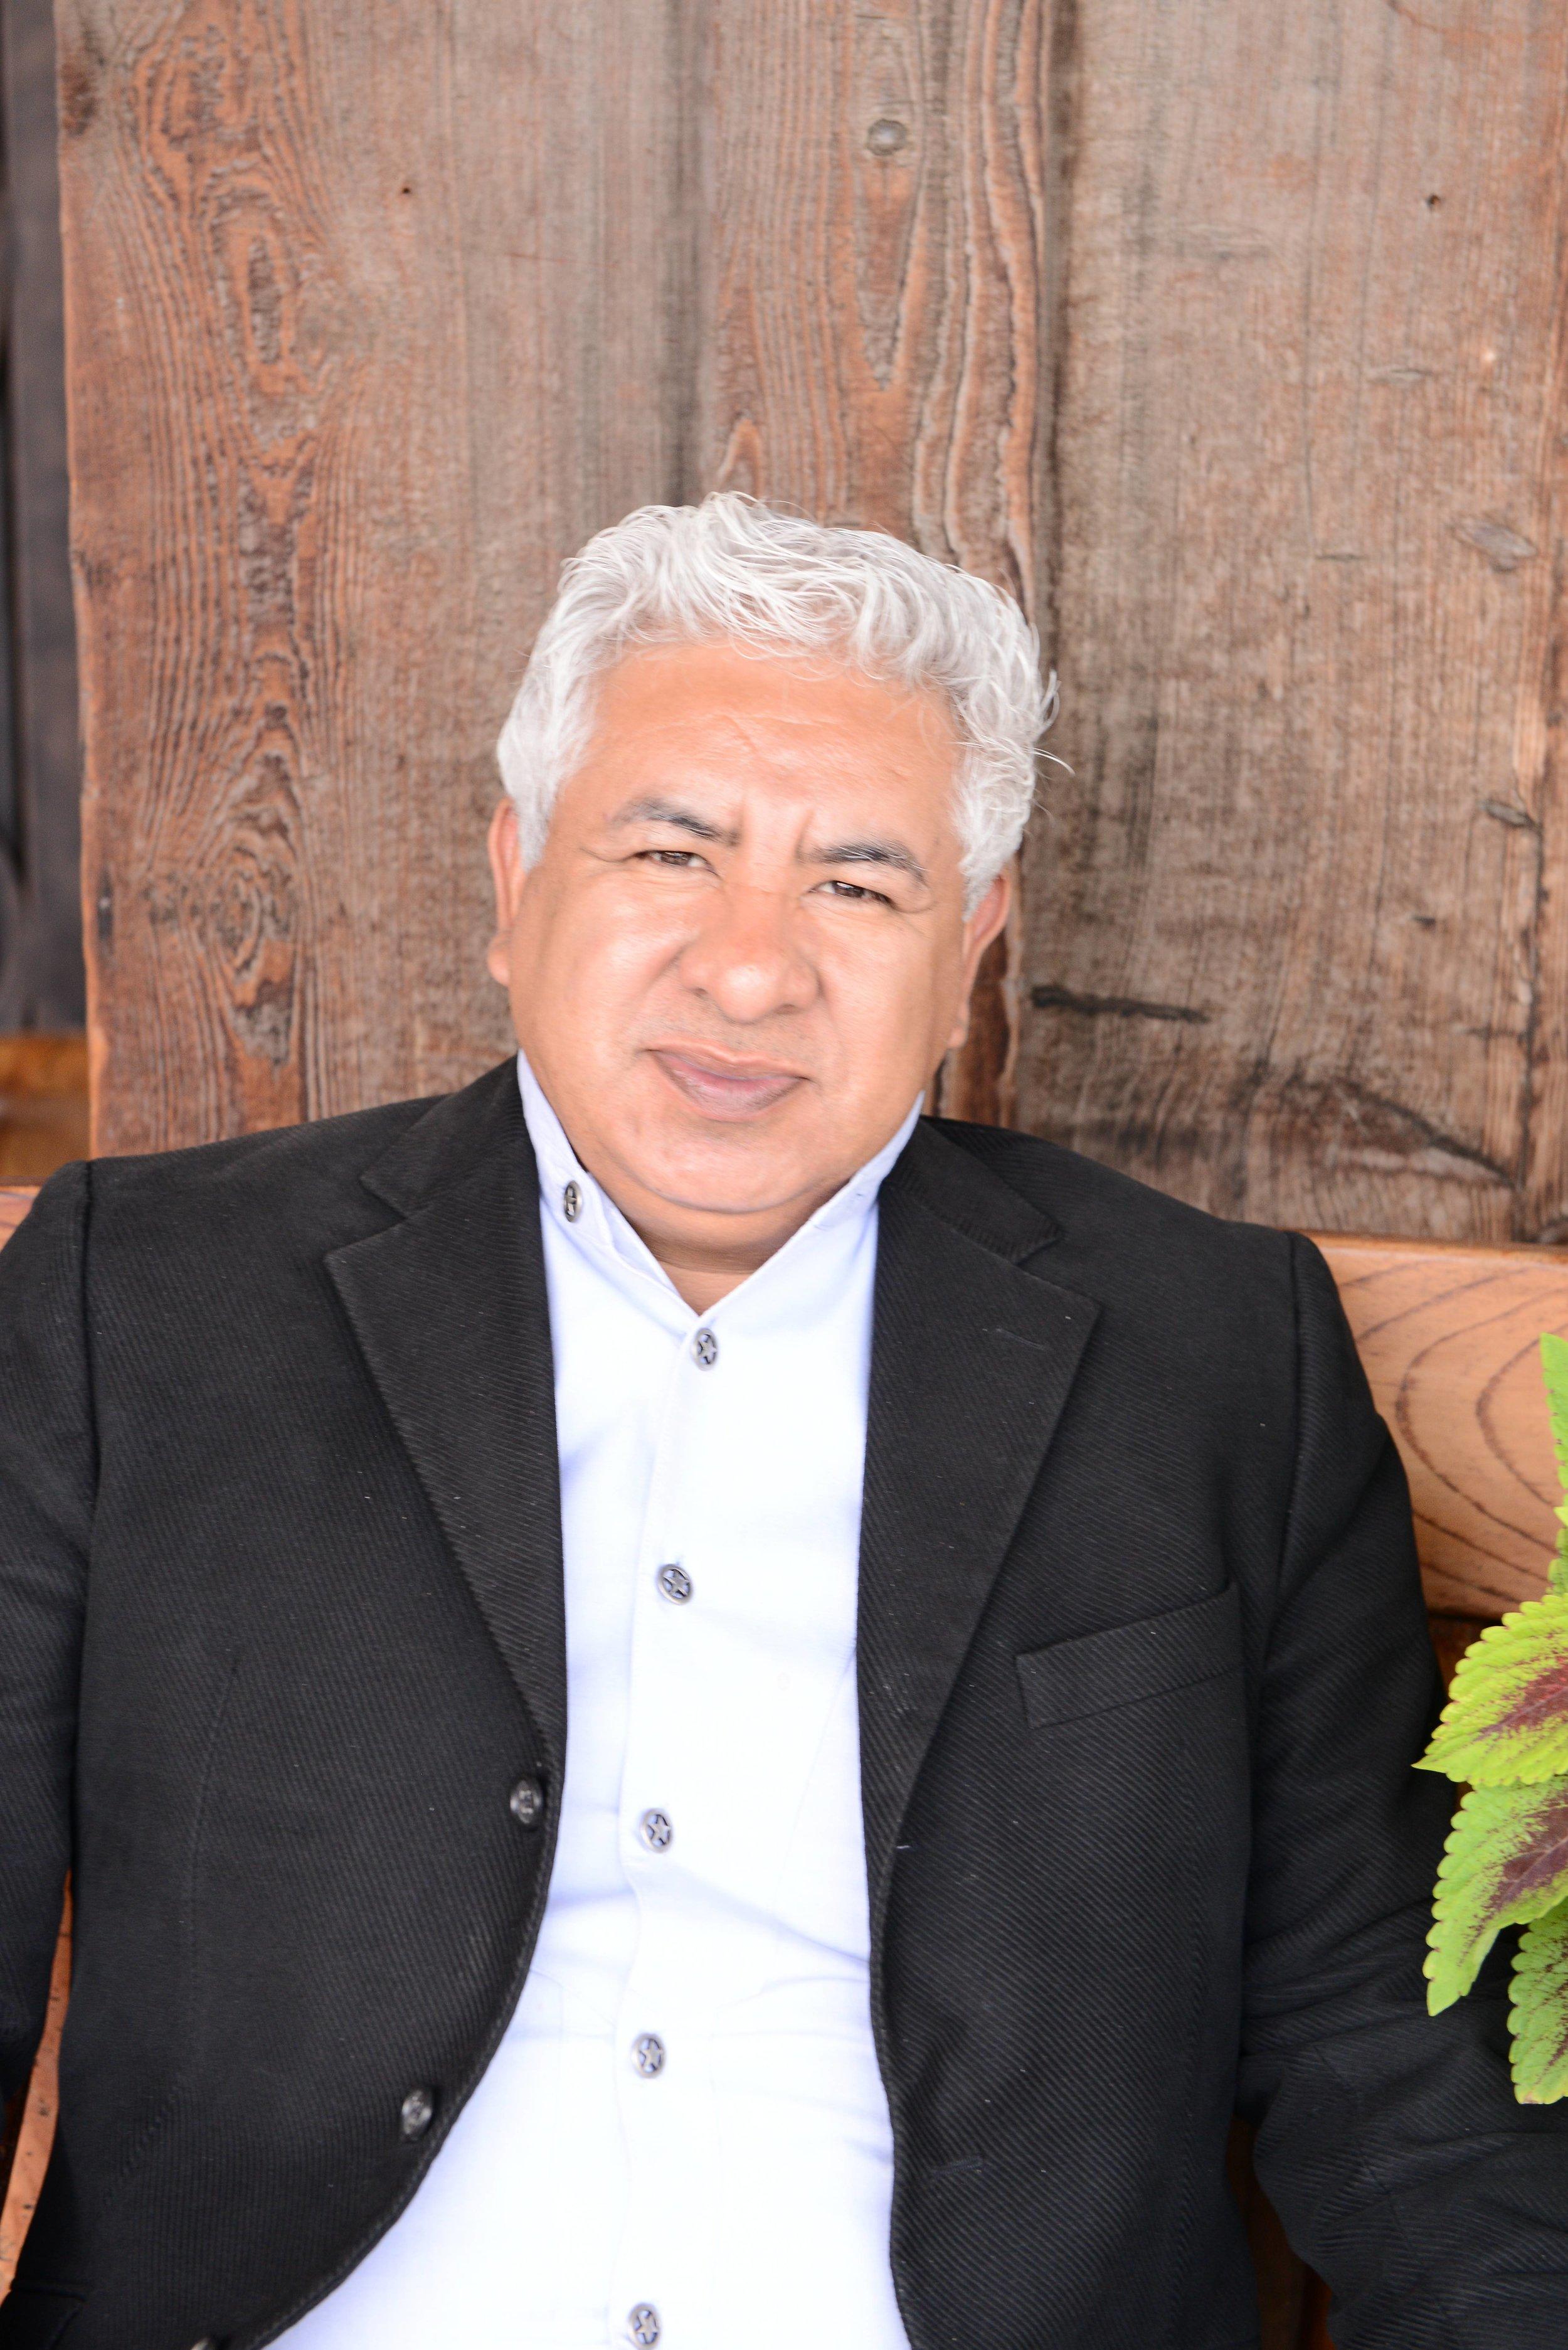 NATIVIDAD RAMIREZ |  PRESIDENT